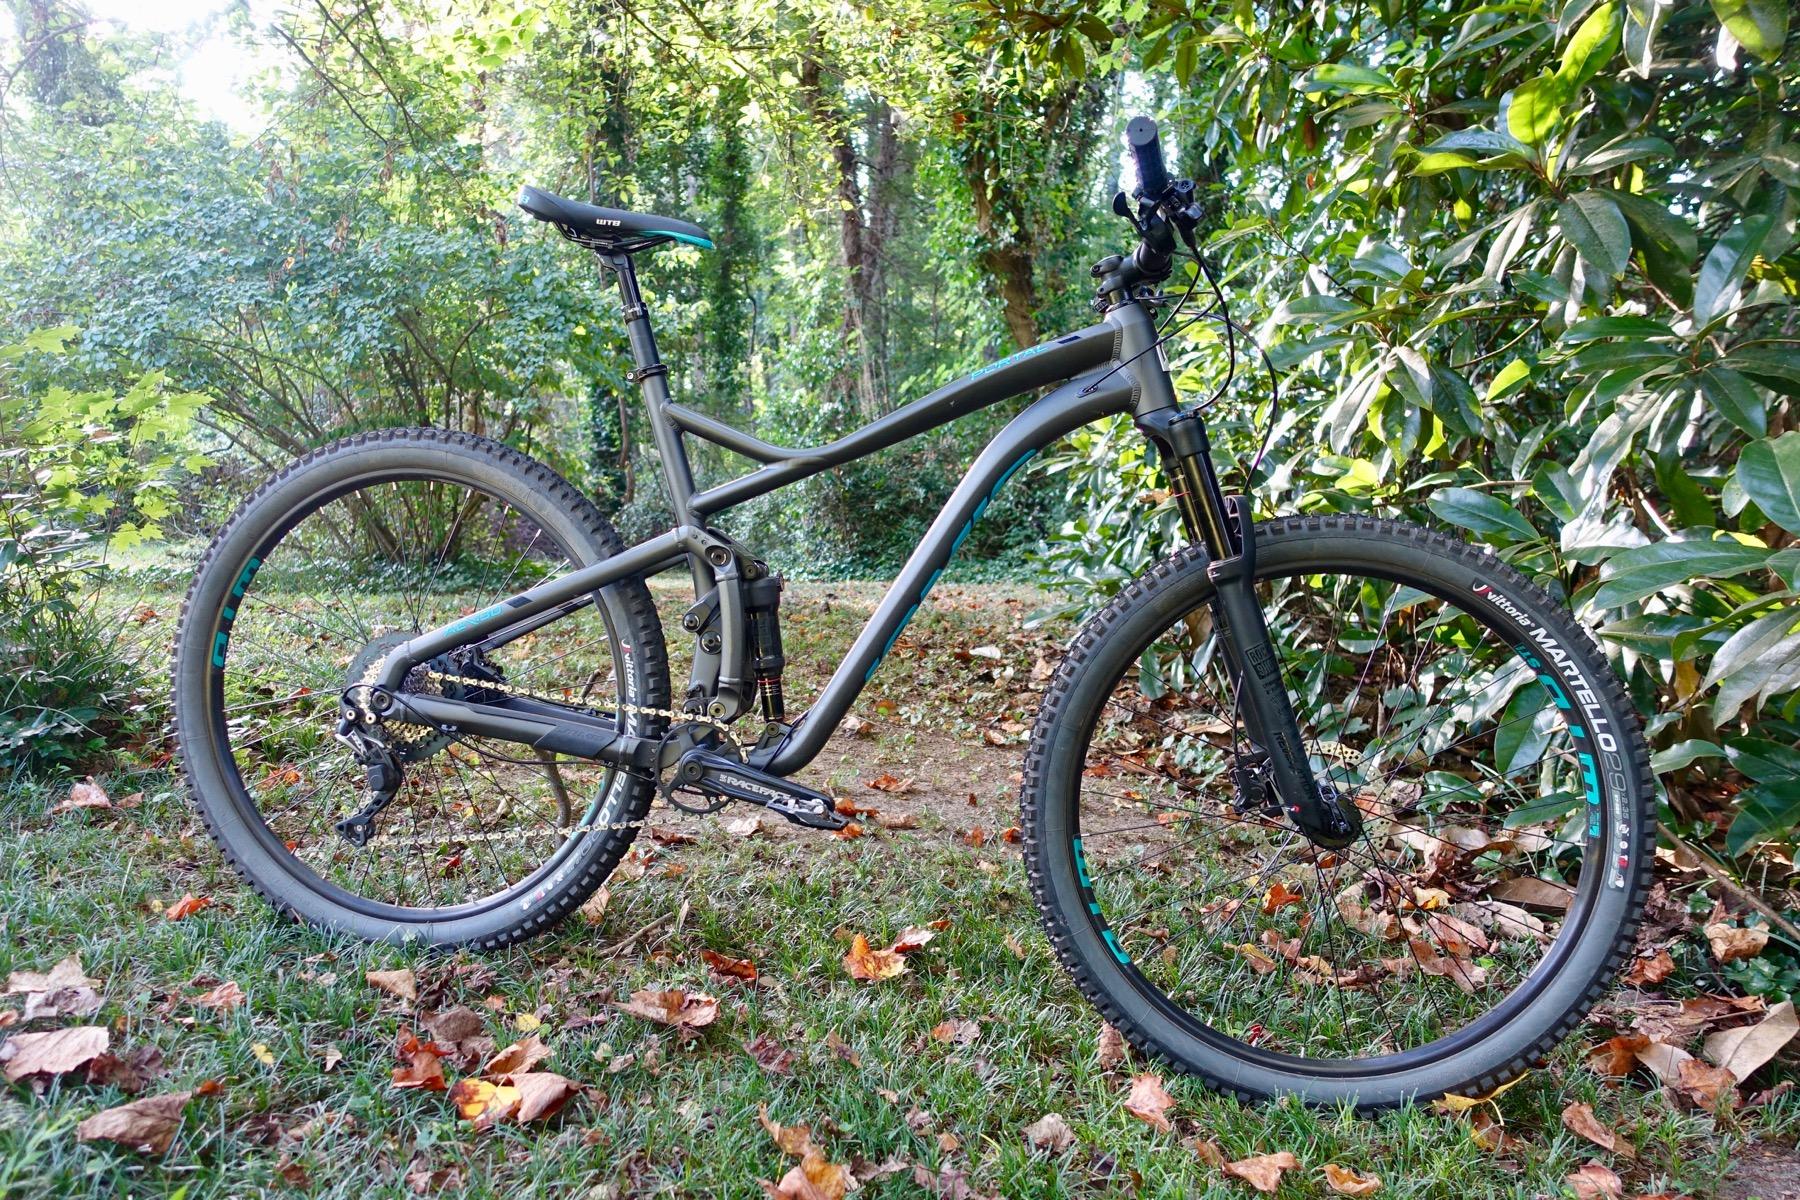 Jamis Portal A2 Trail Bike Review: A Dialed, $3,000 Full Suspension Mountain Bike - Singletracks Mountain Bike News